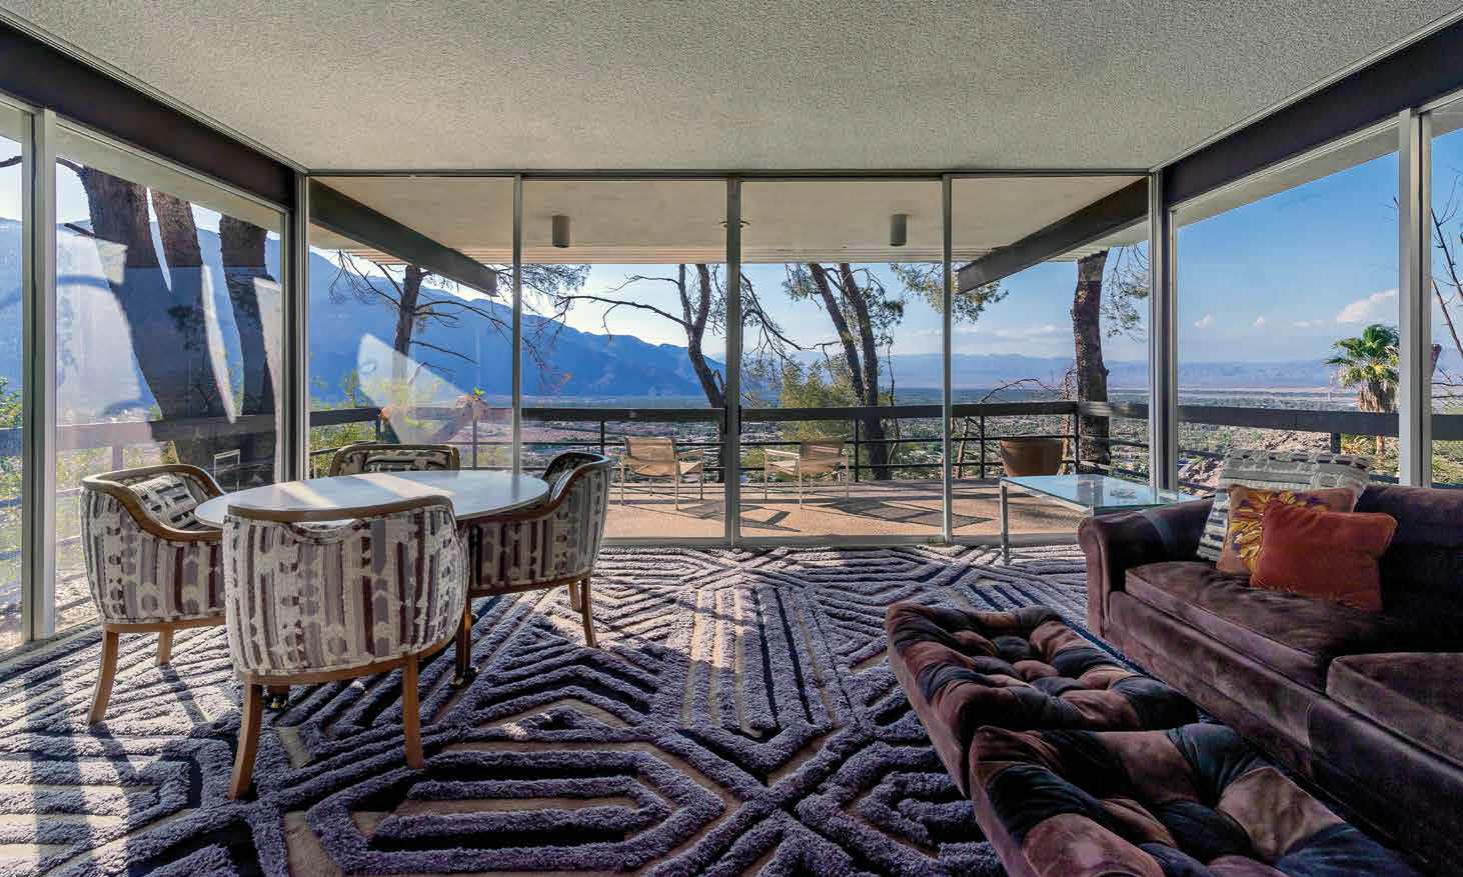 Hollywood Modern, Steve McQueen House